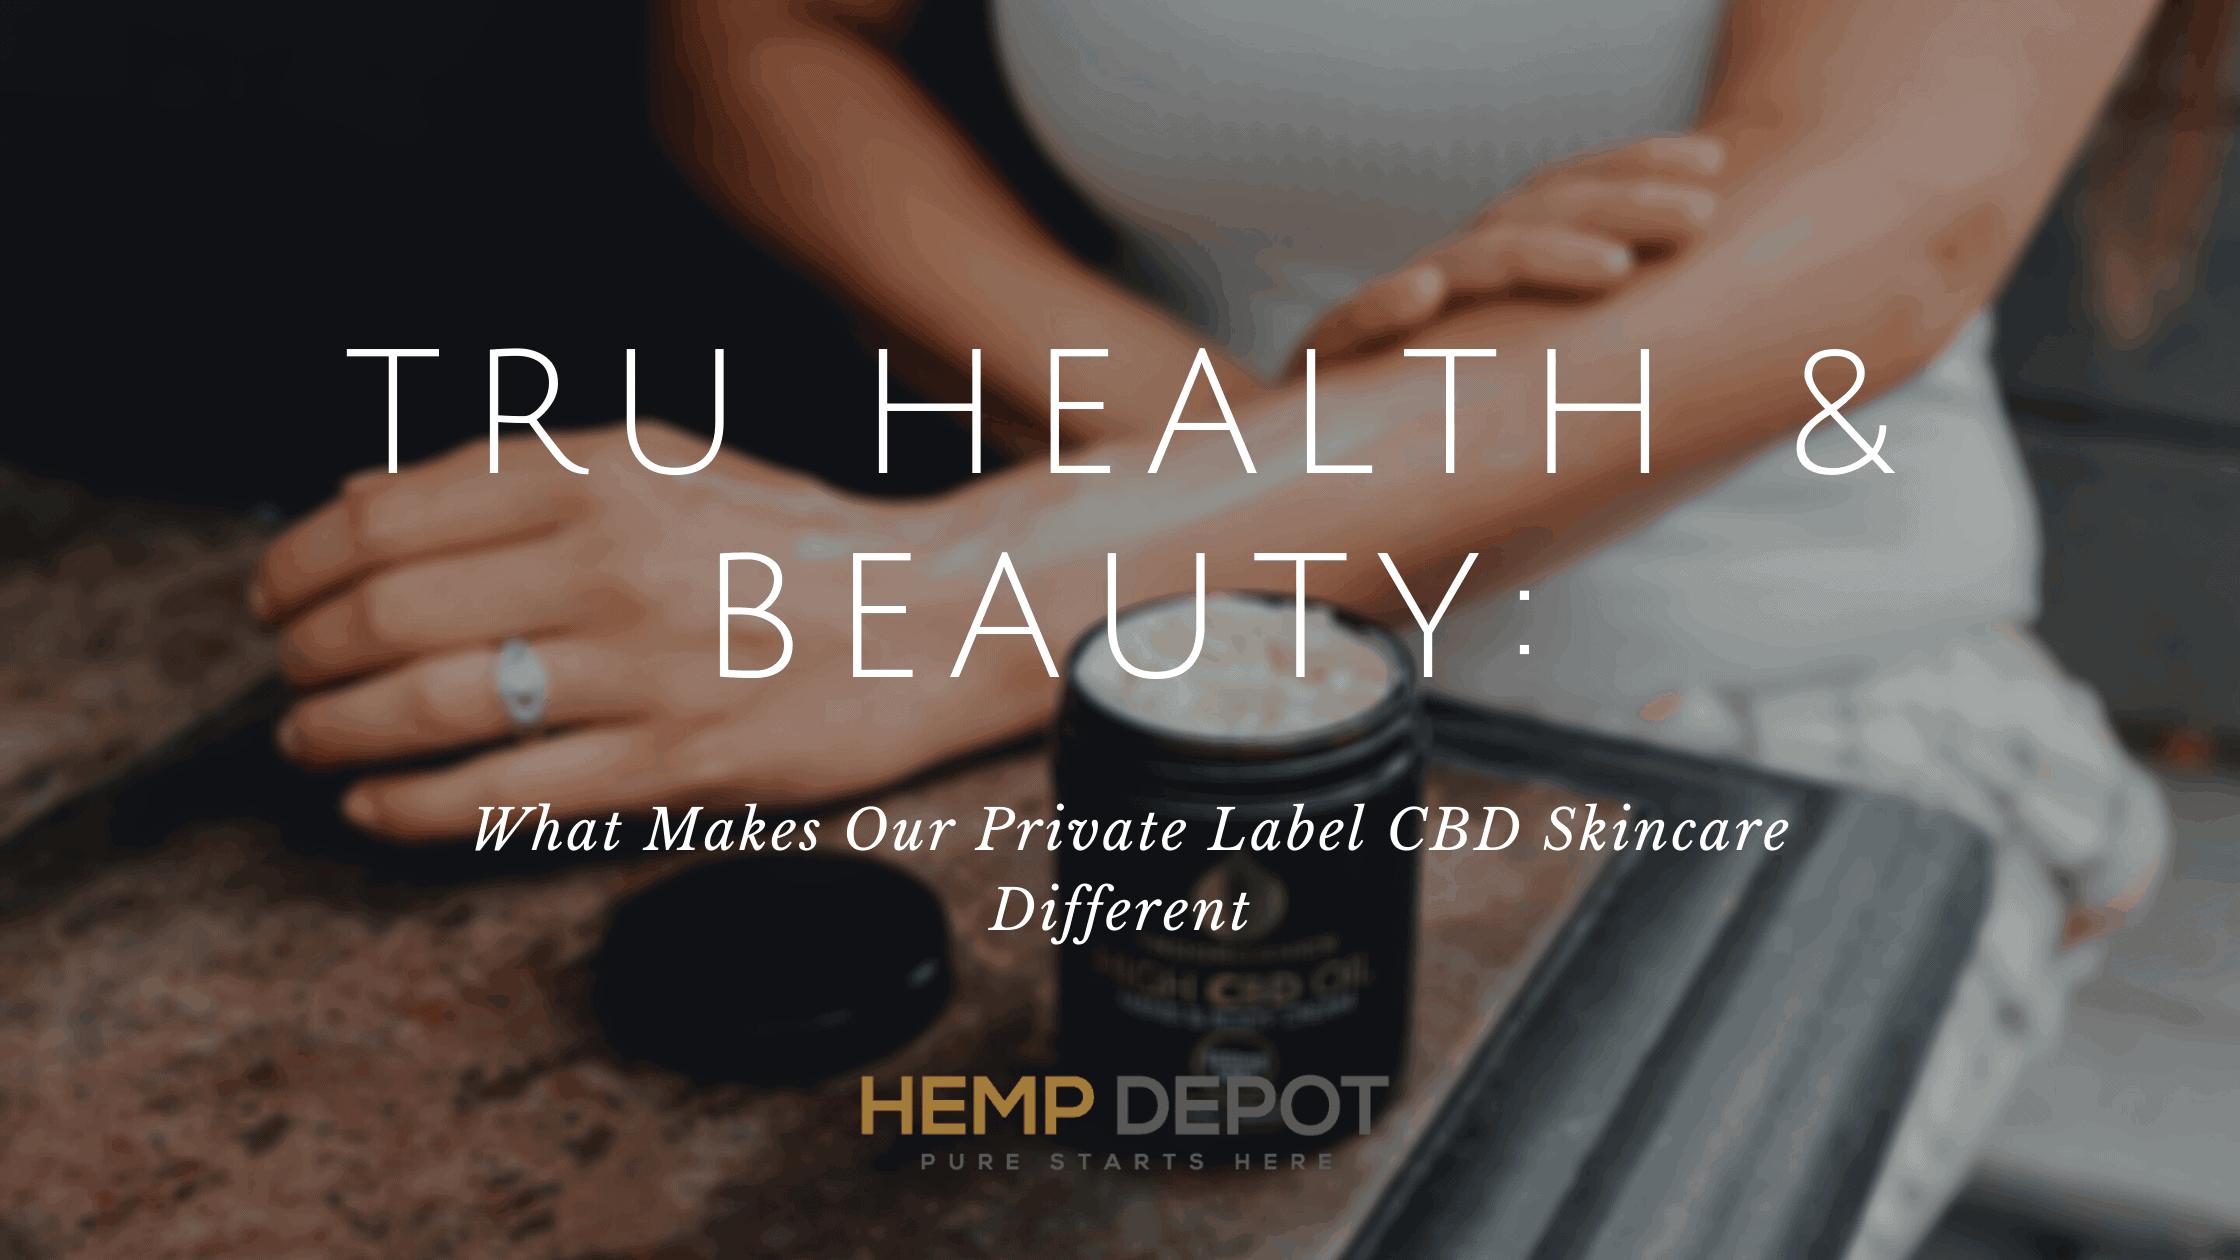 private label cbd skincare hemp depot